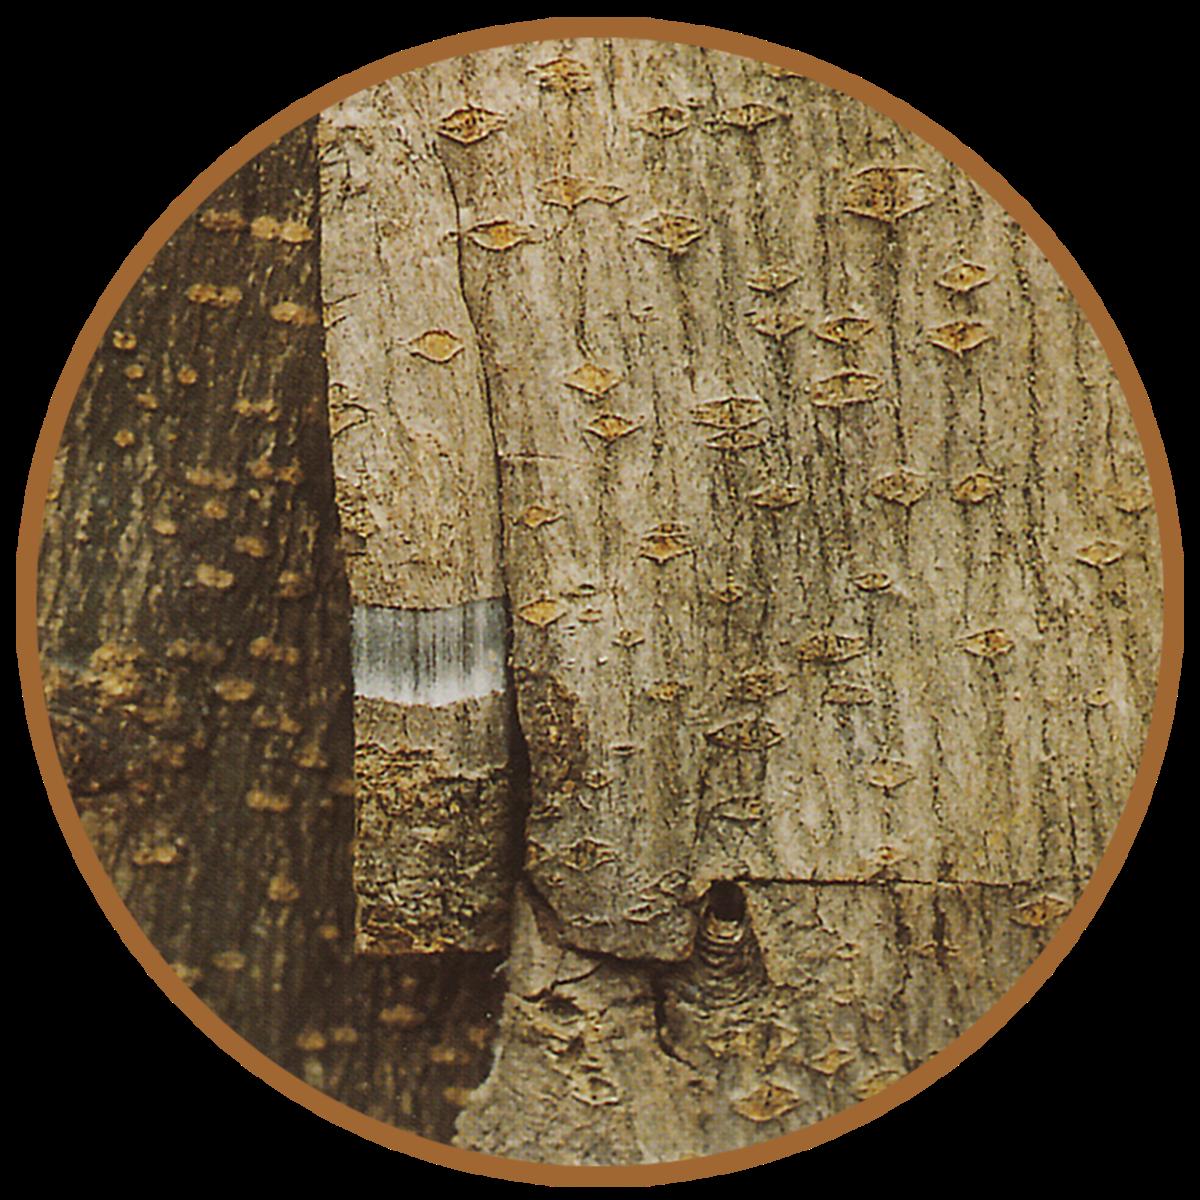 eucommia bark with white latex